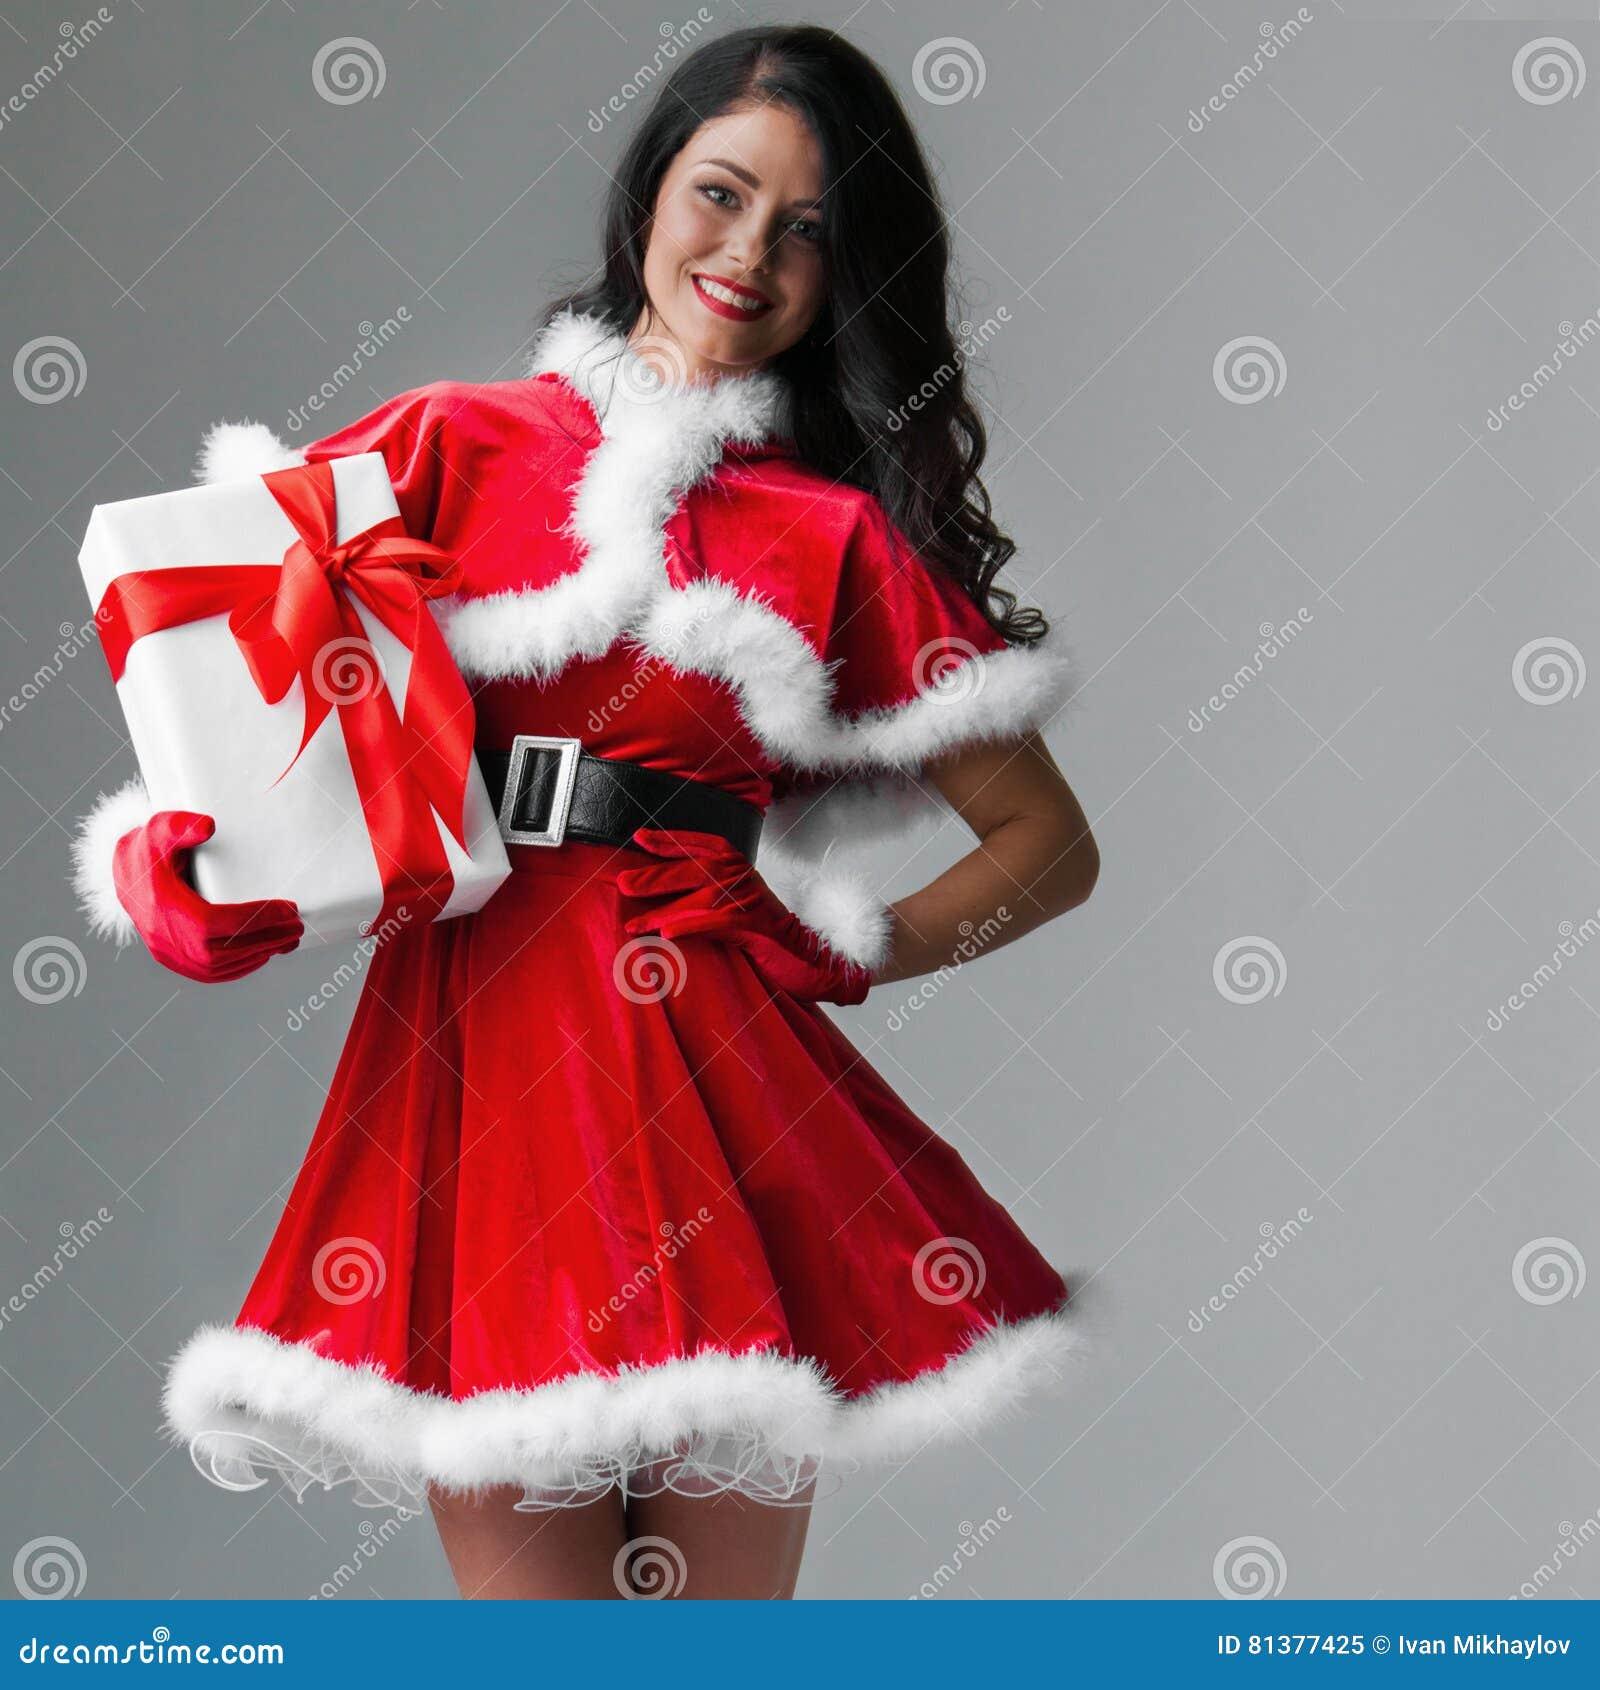 Woman with christmas gift stock image. Image of beauty - 81377425